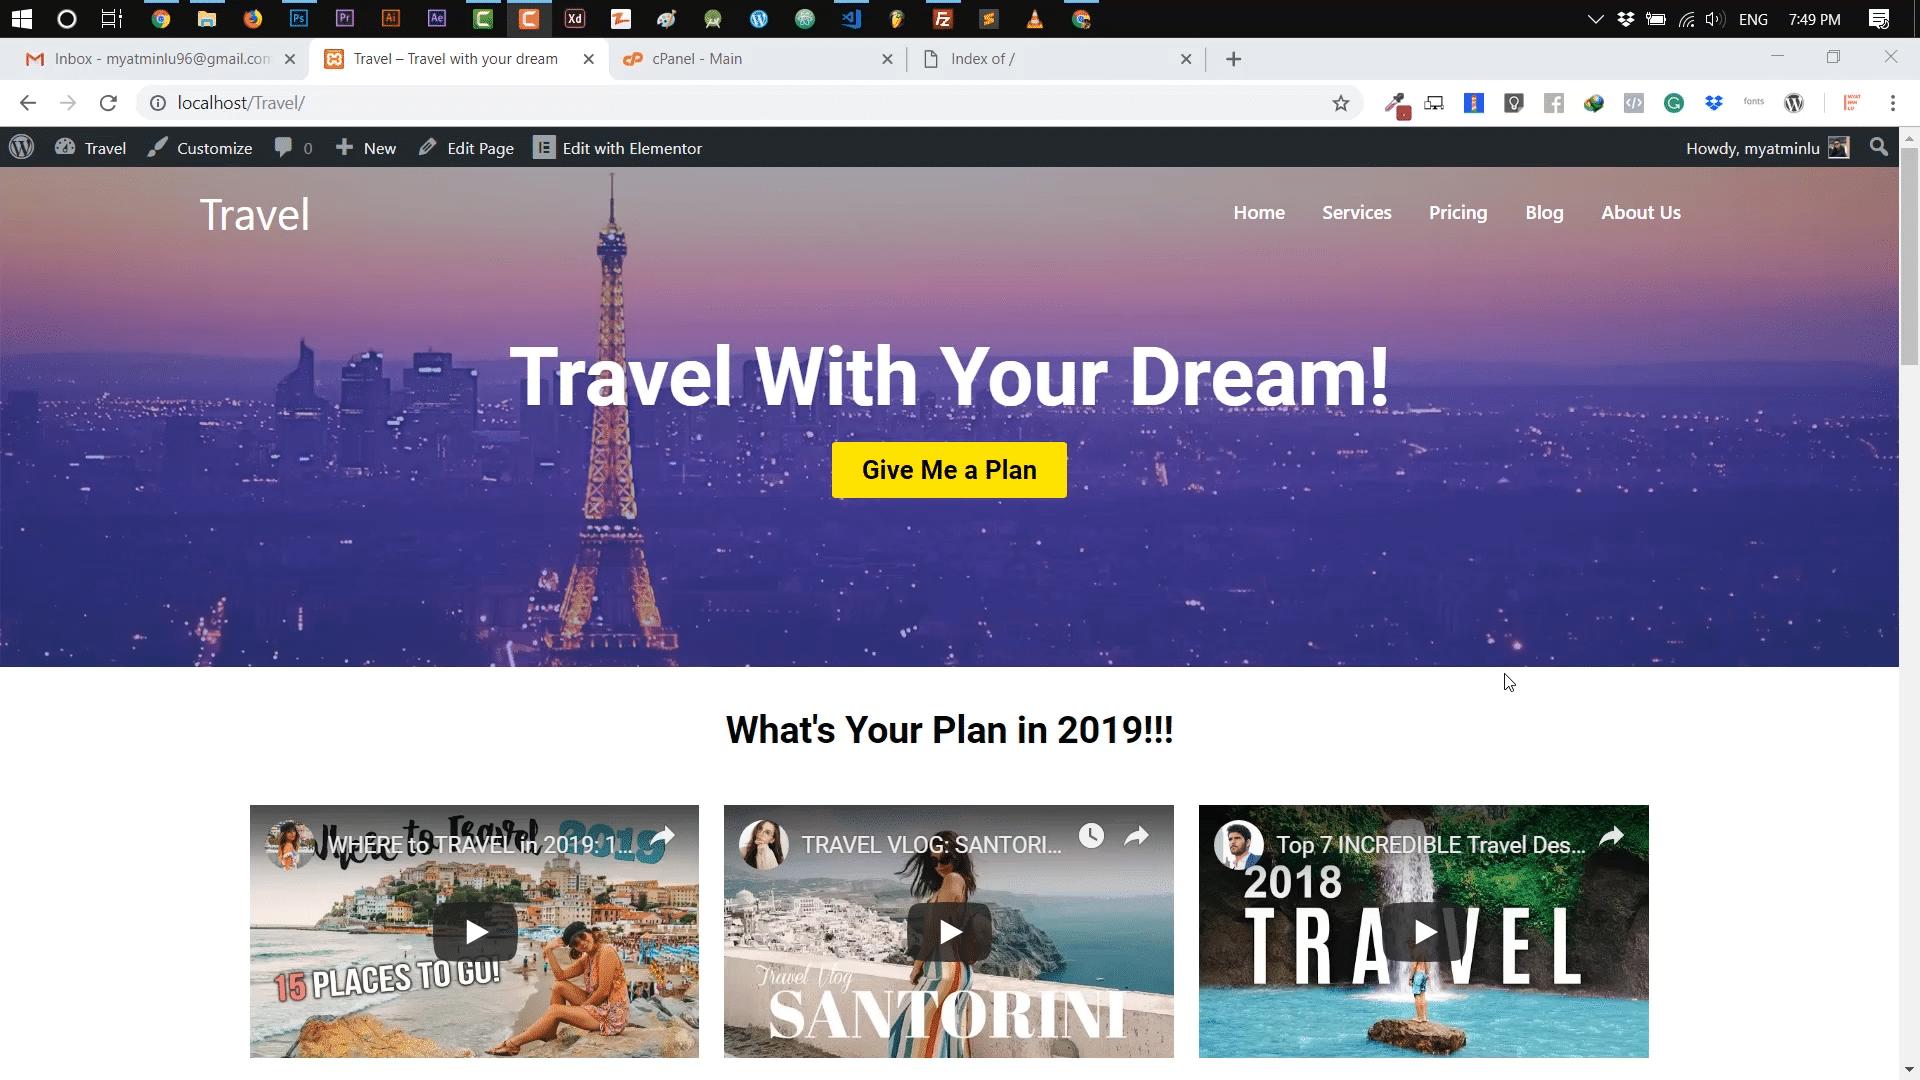 Localhost-website-ကို-အွန်လိုင်းပေါ်သို့-လွှင့်တင်နည်း